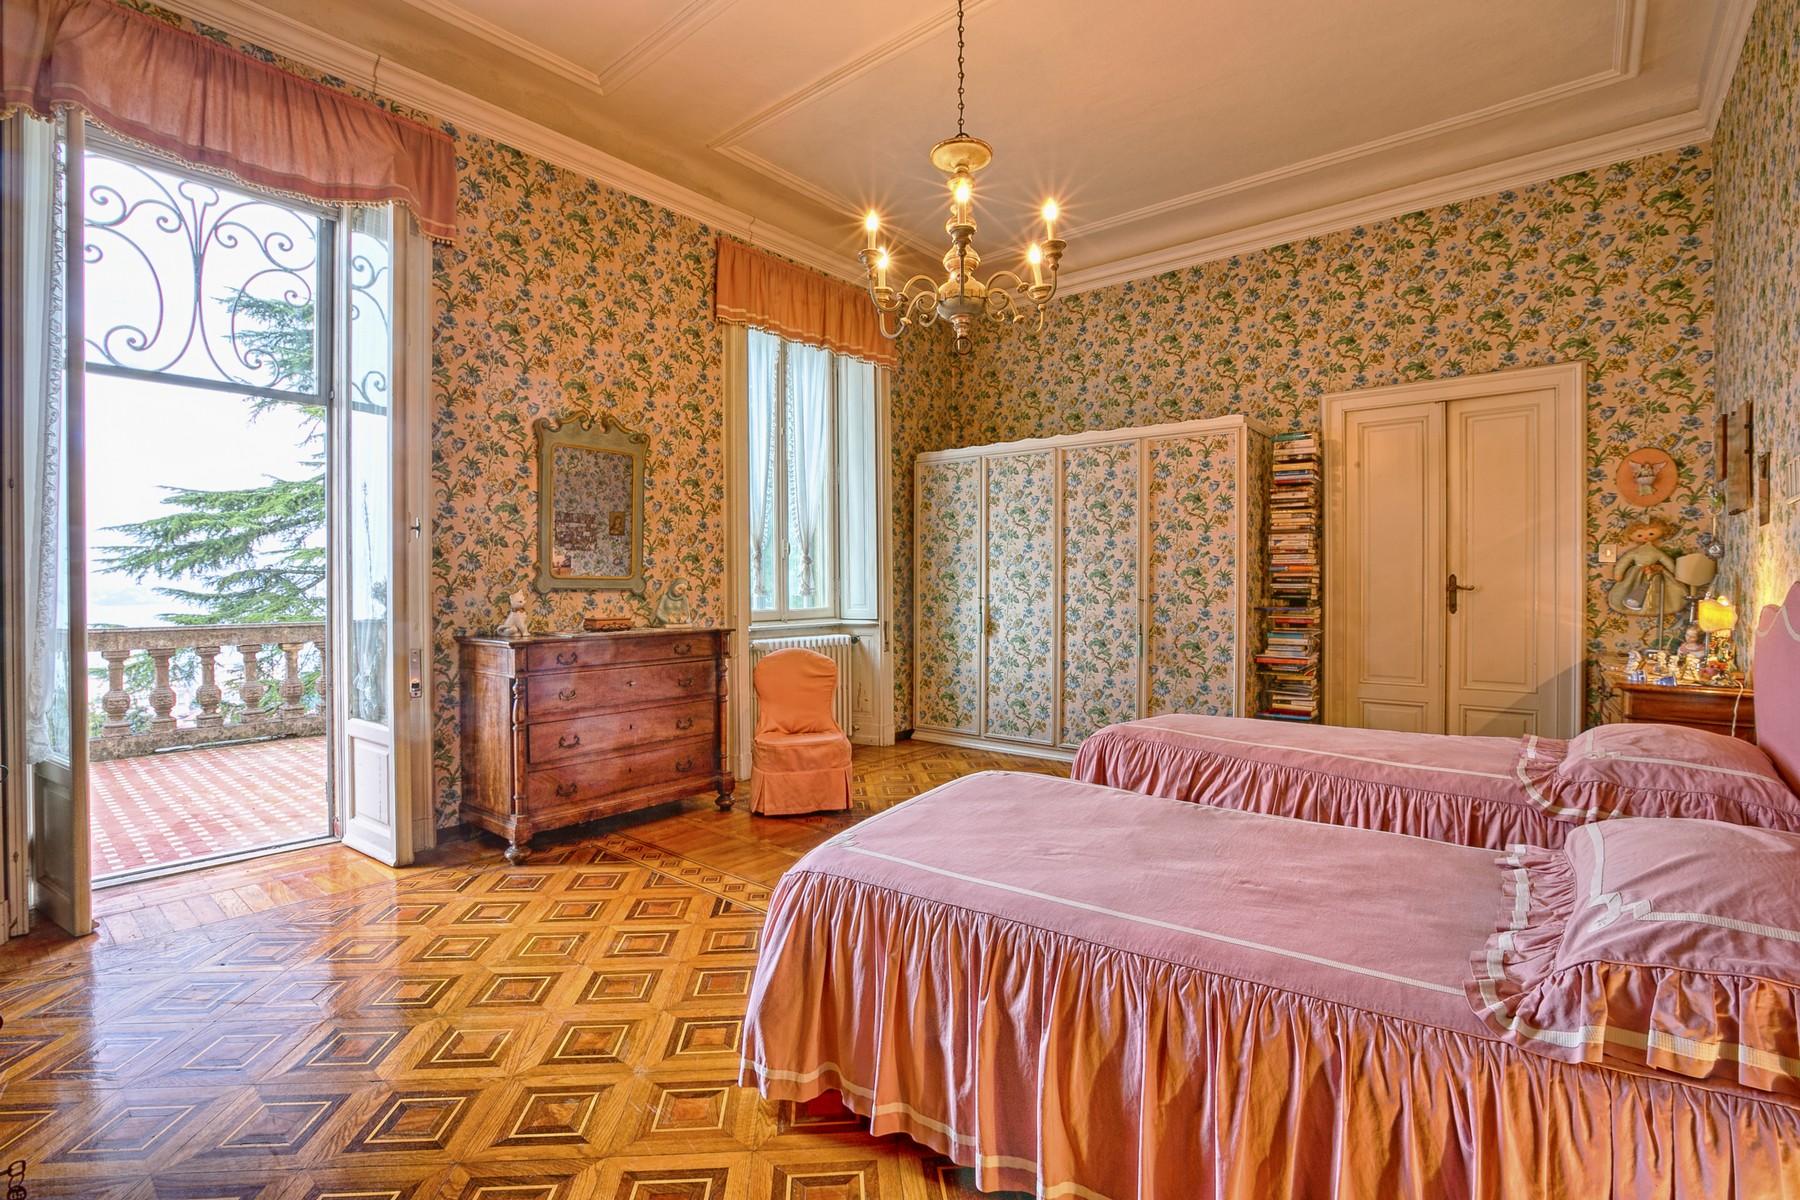 Villa in Vendita a Stresa: 5 locali, 800 mq - Foto 23